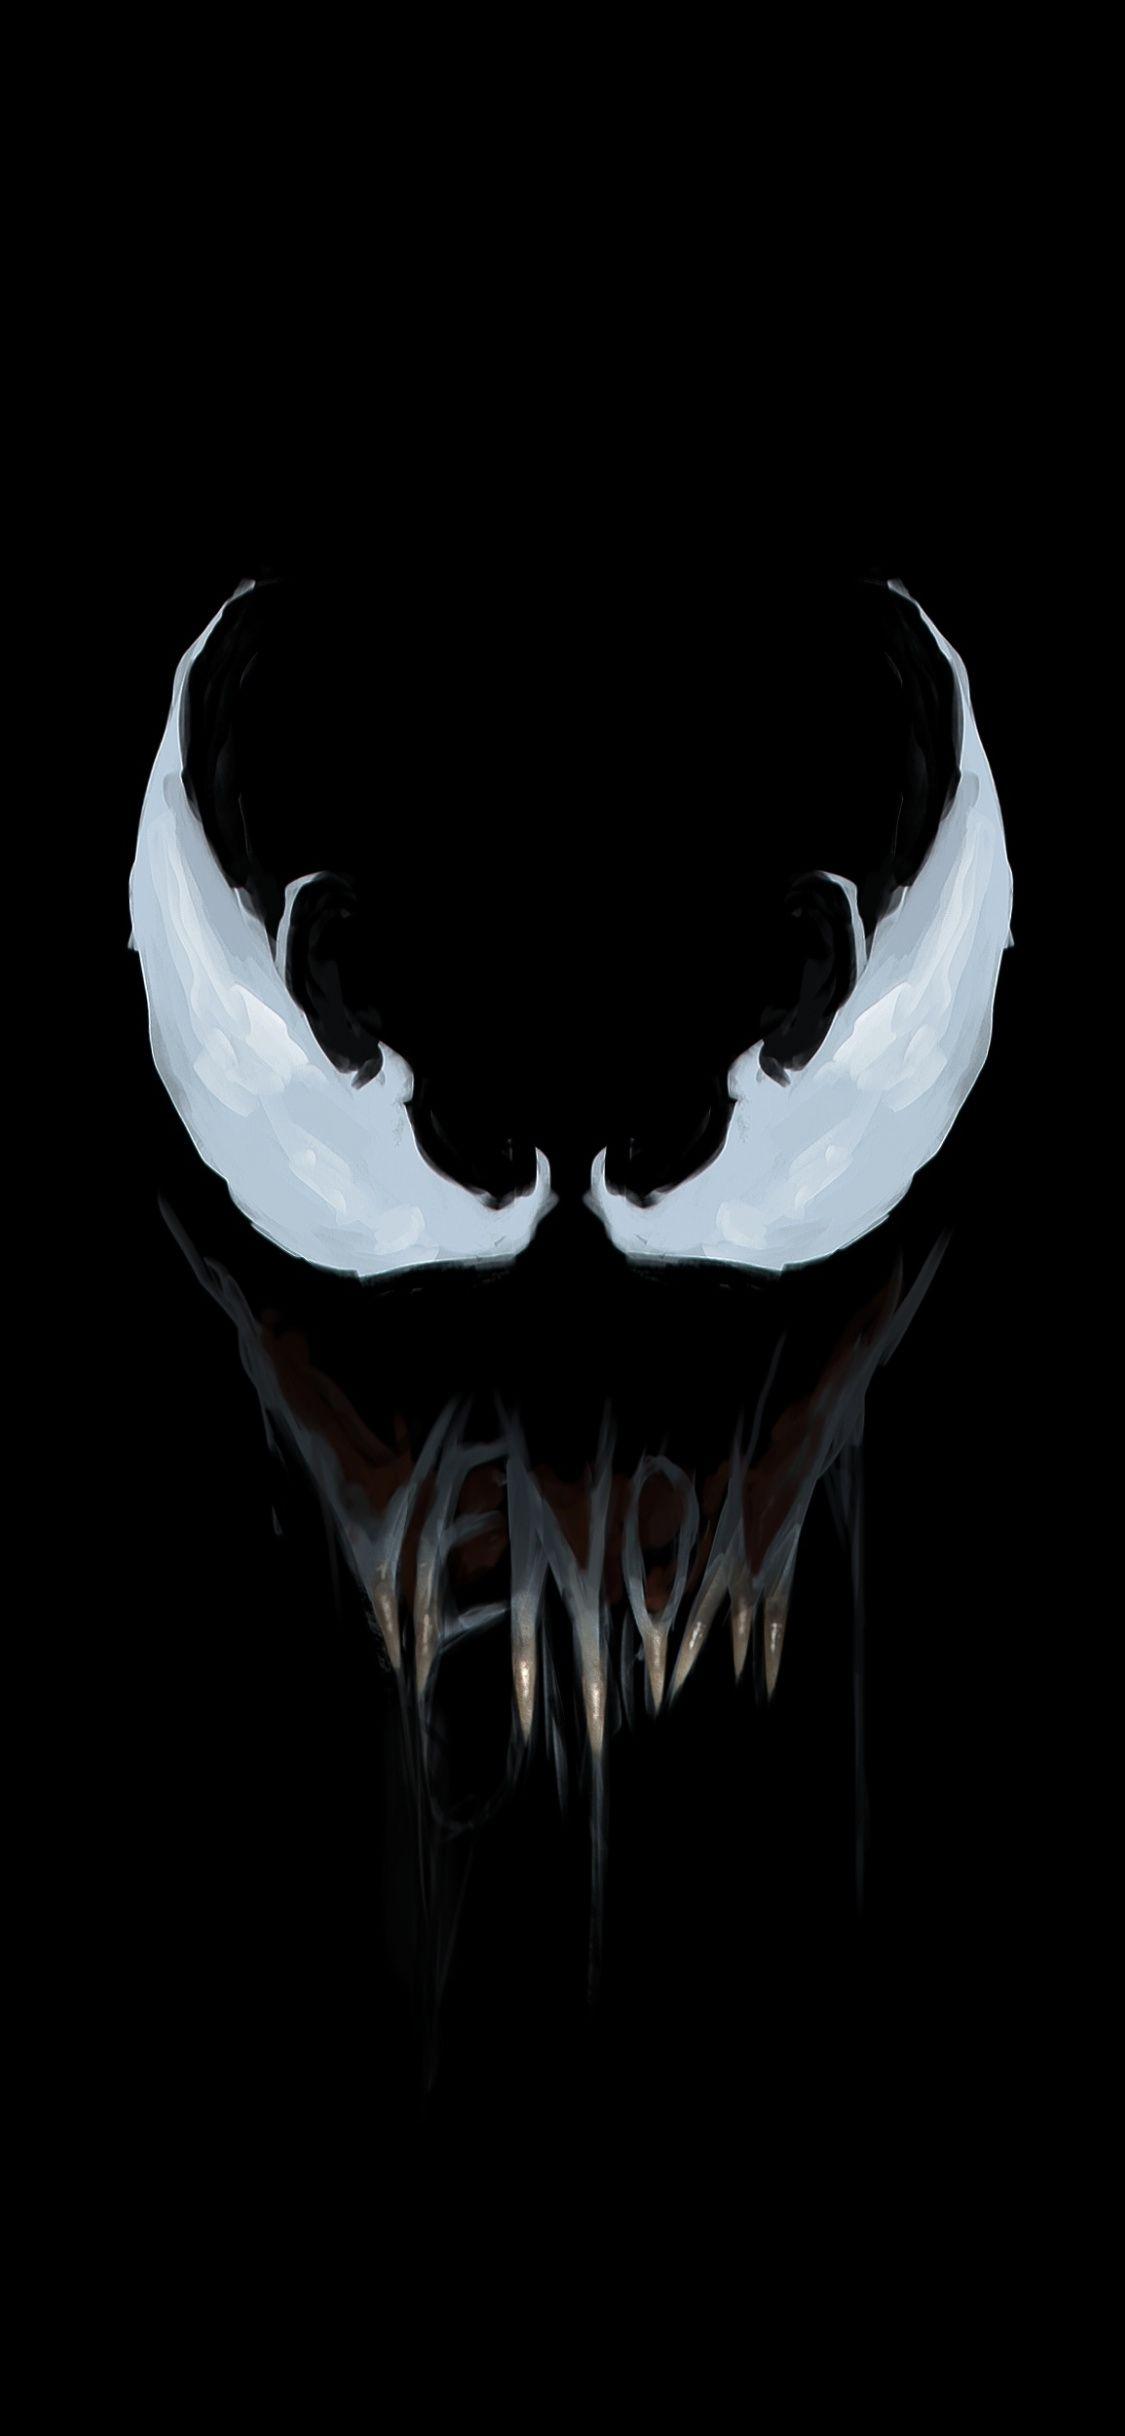 Minimal Venom Super Villain Art 1125x2436 Wallpaper Comics Y Dibujos Animados Fondo De Pantalla Para Telefonos Iphone Fondos De Pantalla